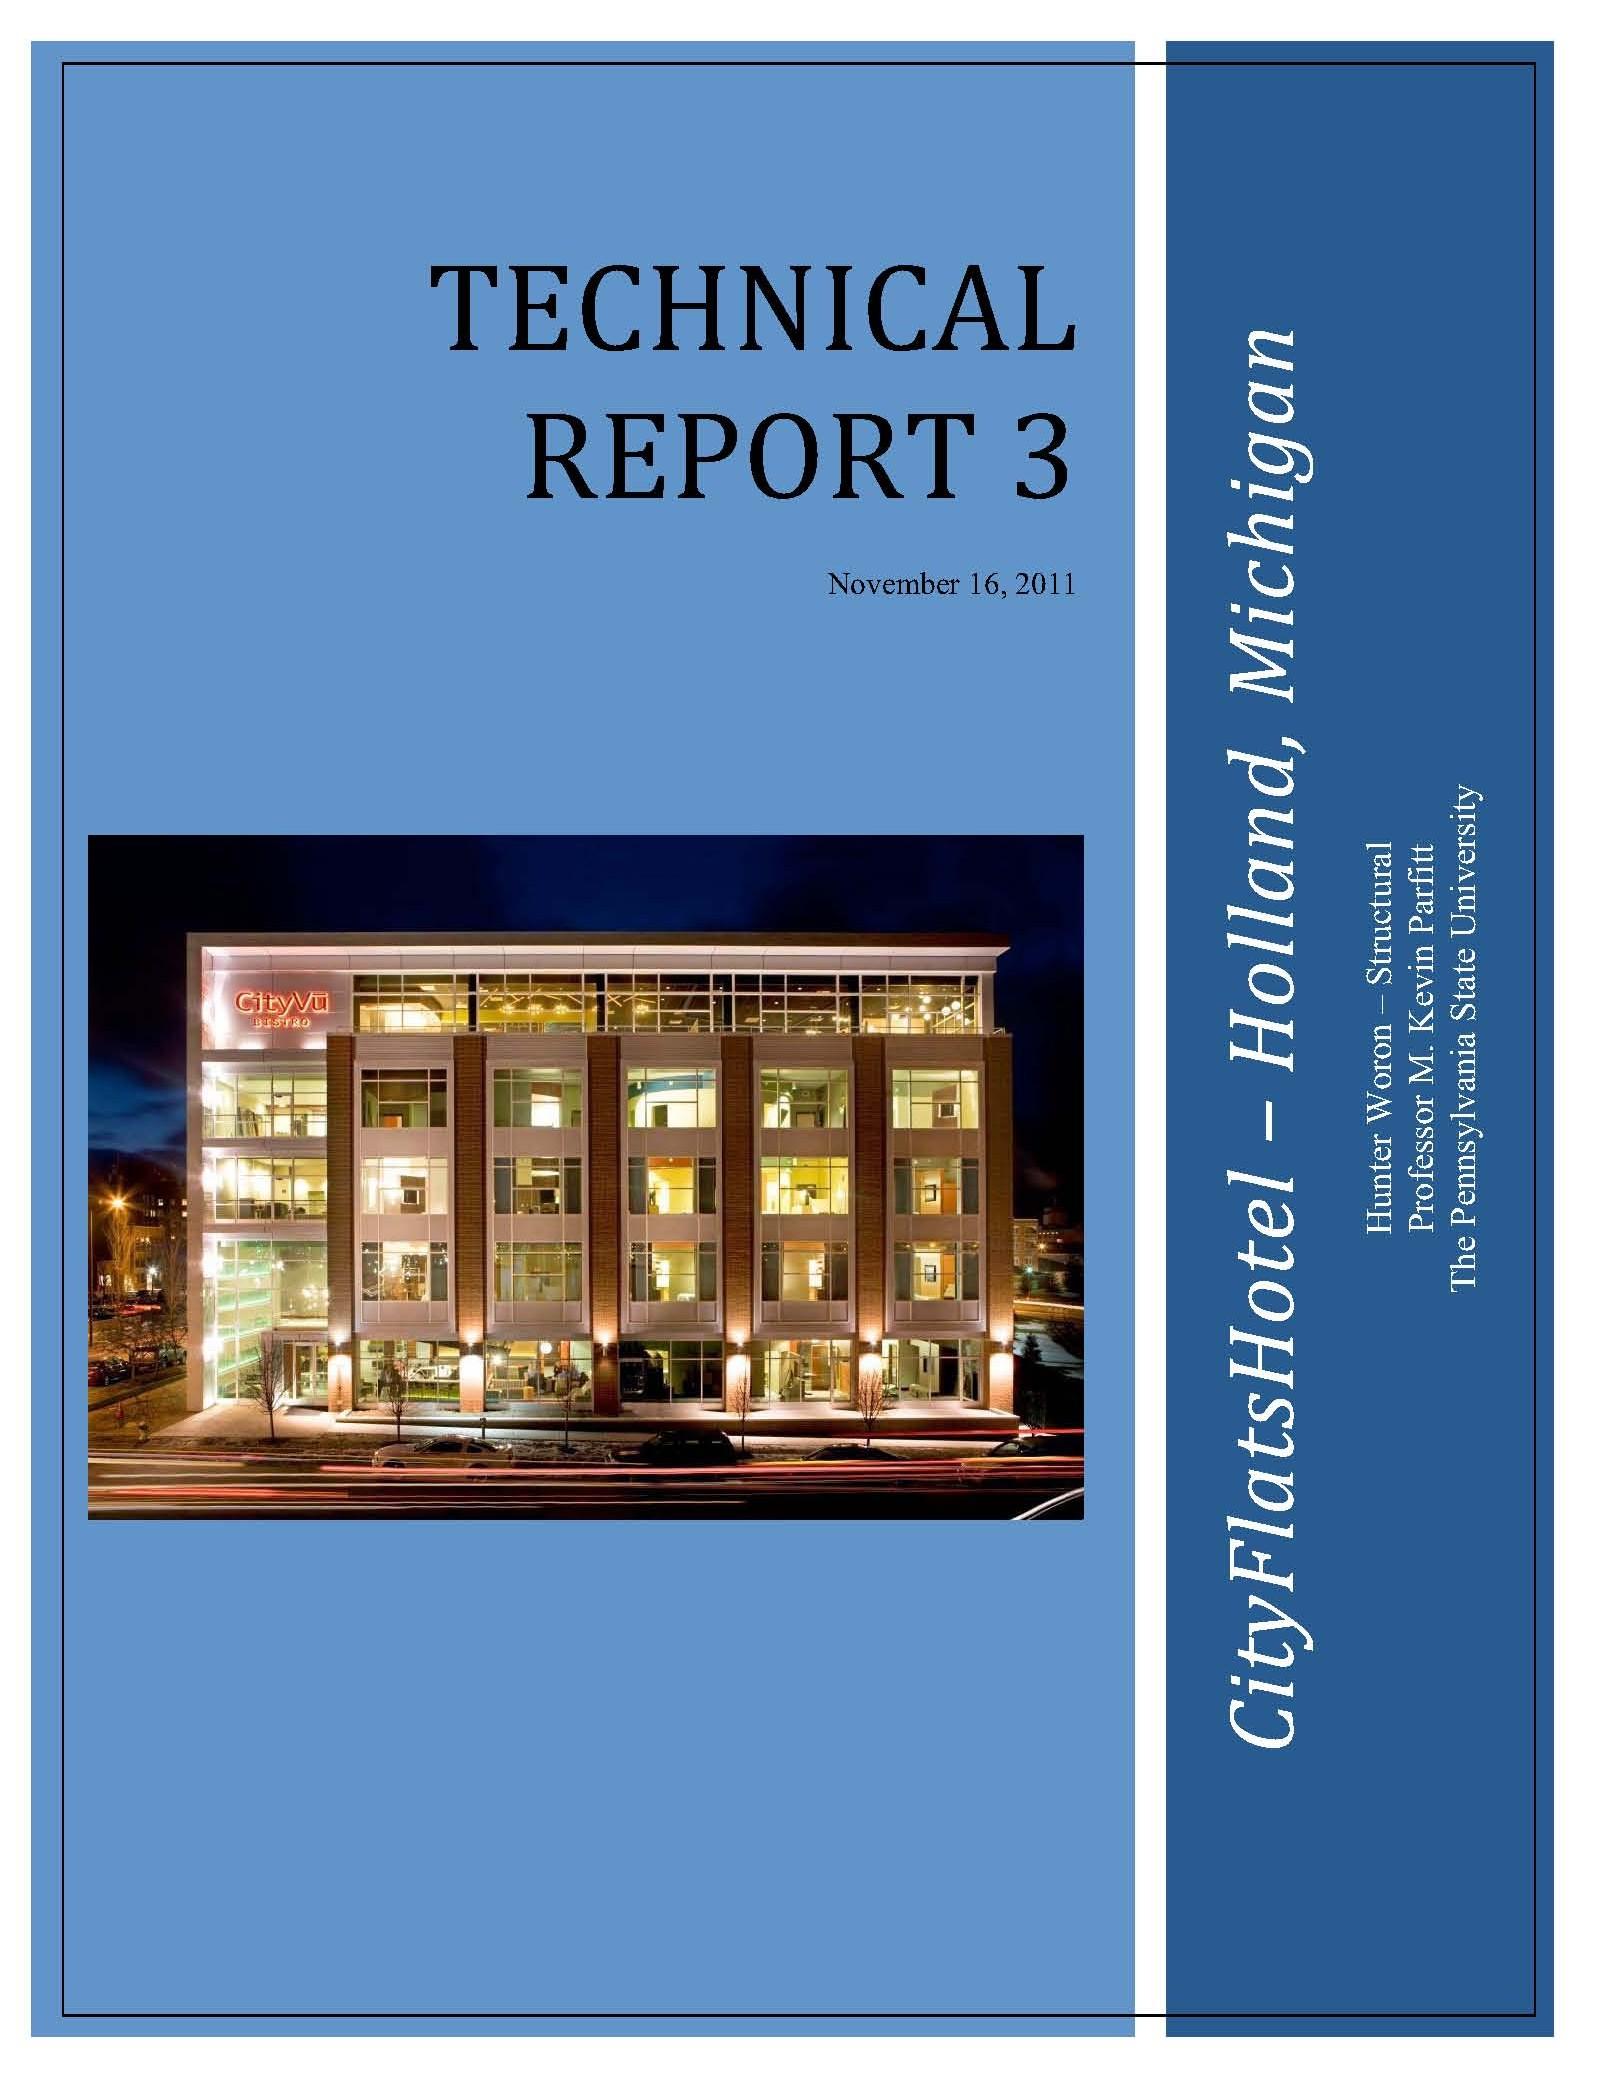 cityflatshotel technical reports tech report three